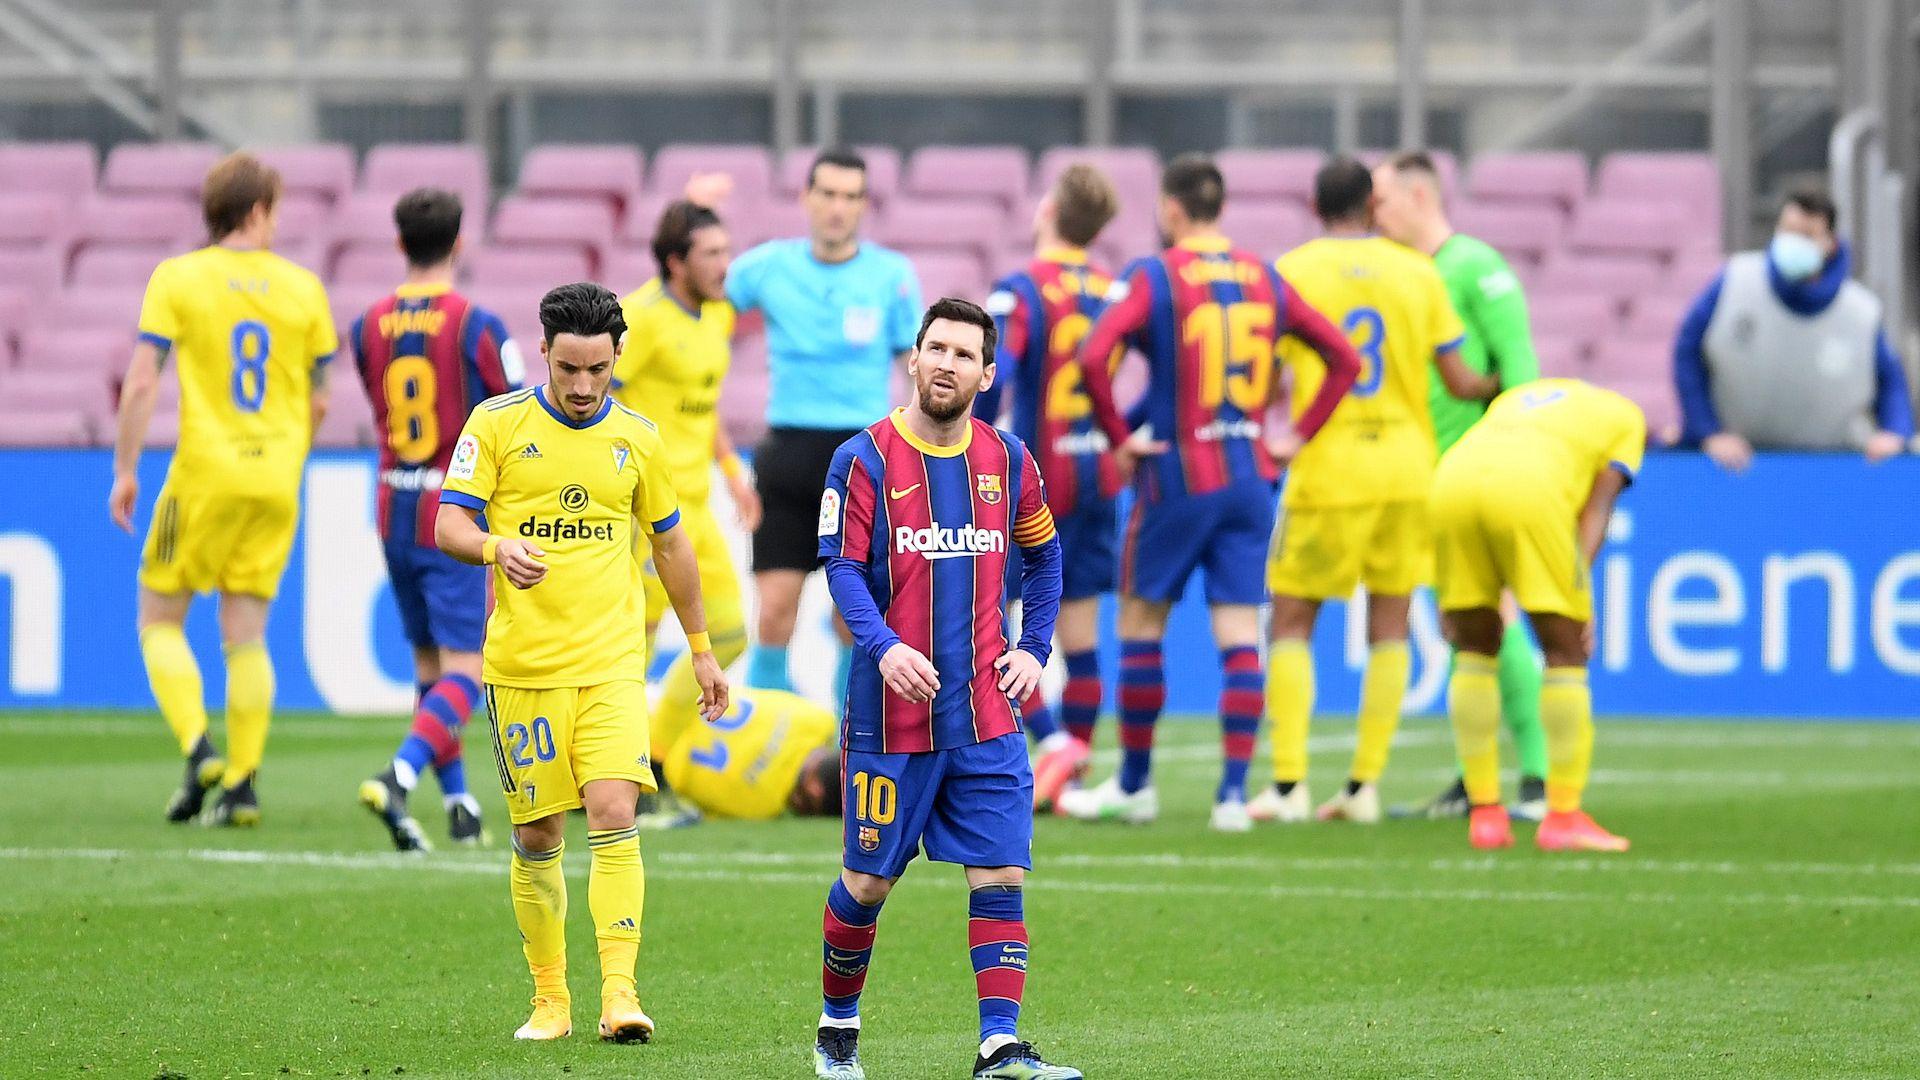 Издънка срещу новак помрачи поредния рекорд на Меси в Барселона